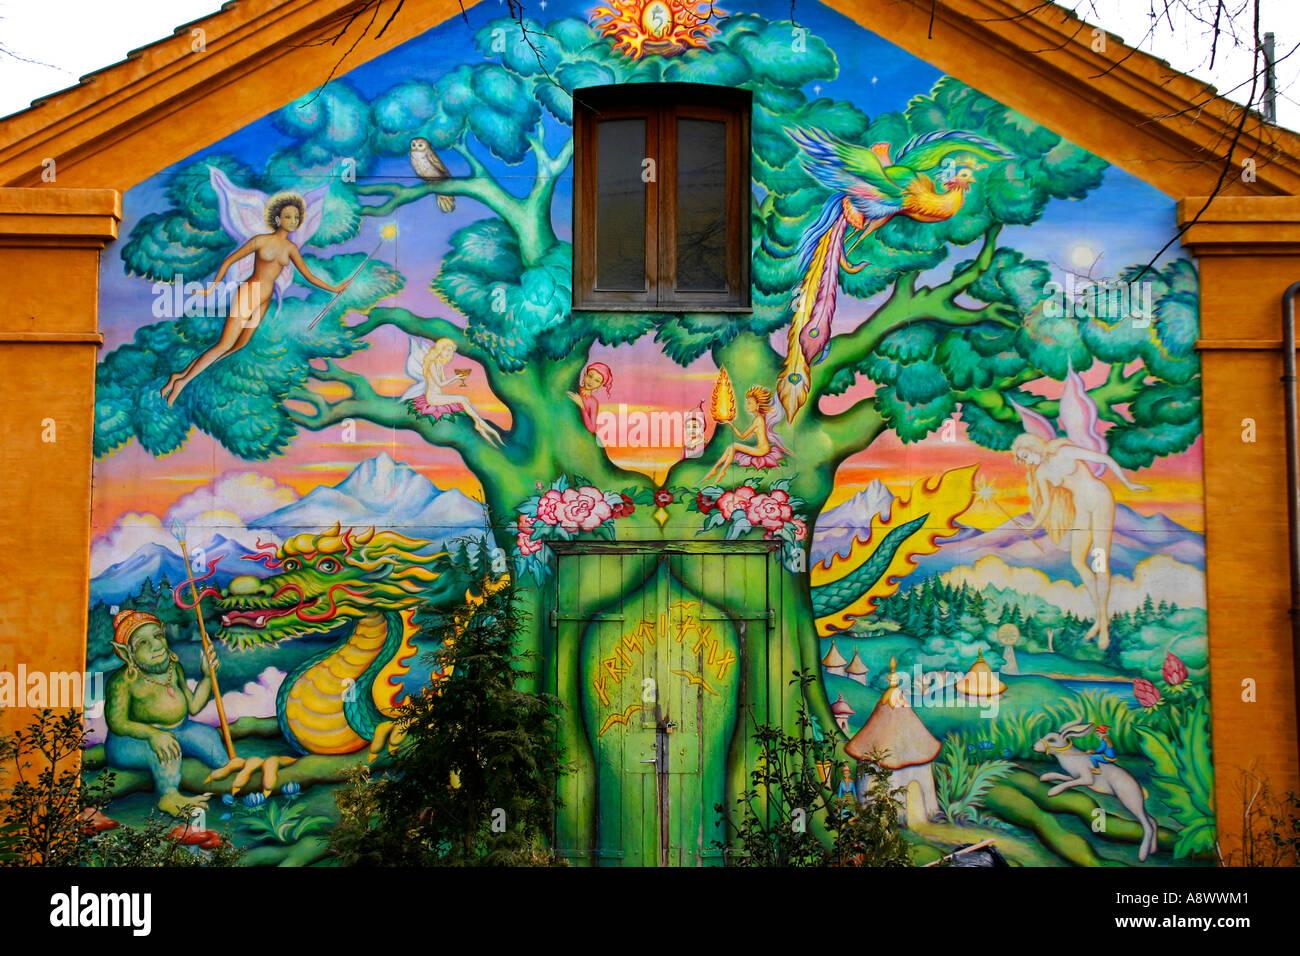 A wall mural in Cristiania. The hippie area of Copenhagen Denmark - Stock Image